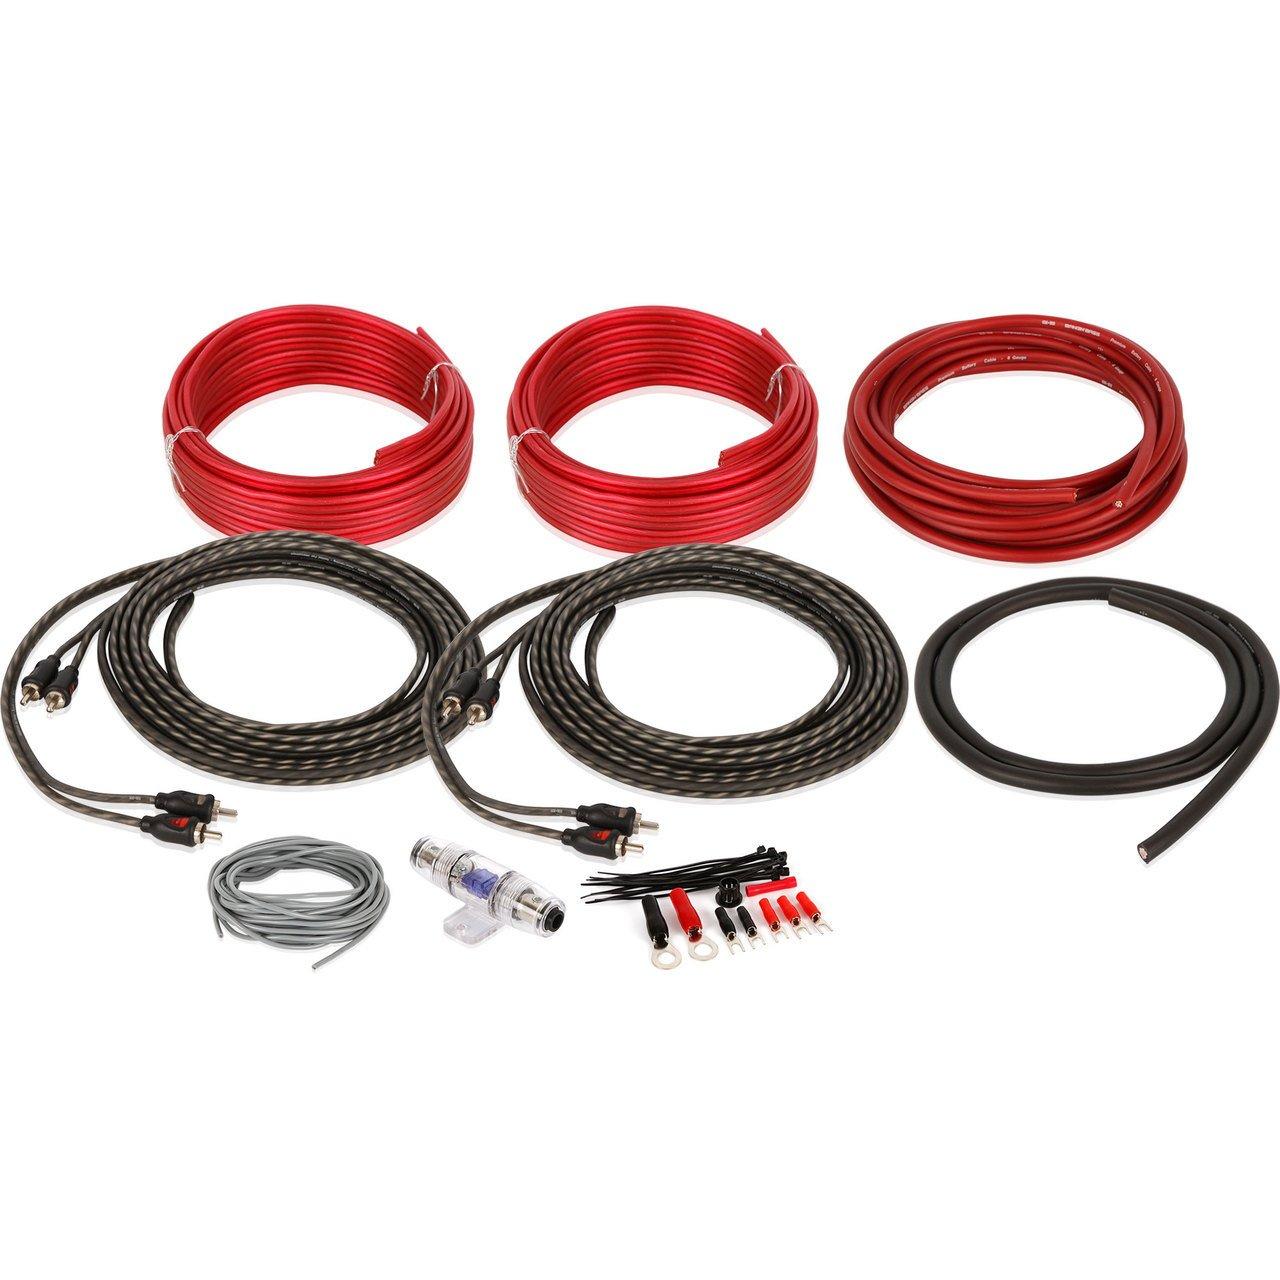 Professional Grade Belva Complete True Spec 8 Gauge 4 Ga Awg Amplifier Amp Wiring Wire Kit Installation Channel Bak84 Automotive